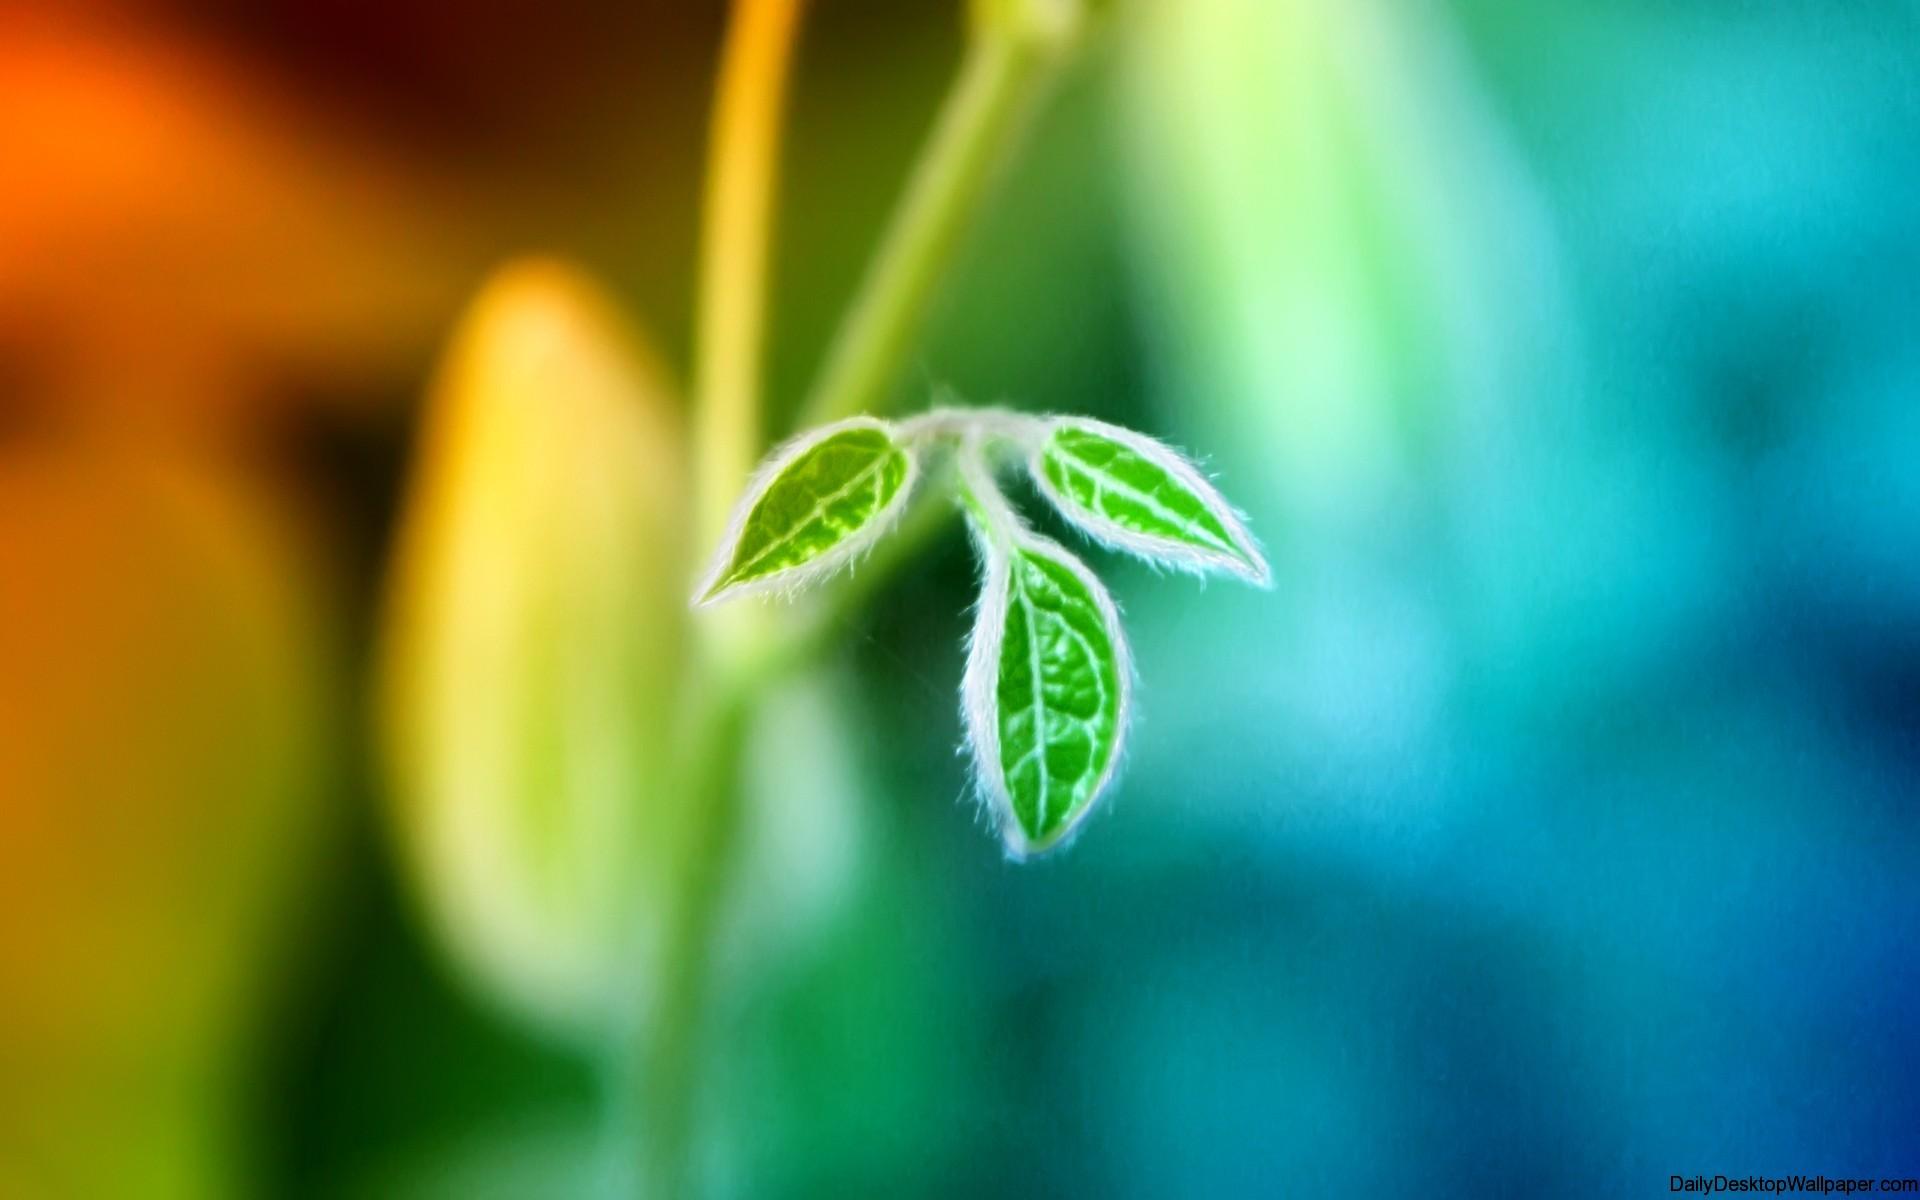 High-resolution-up-close-leaf-wallpaper